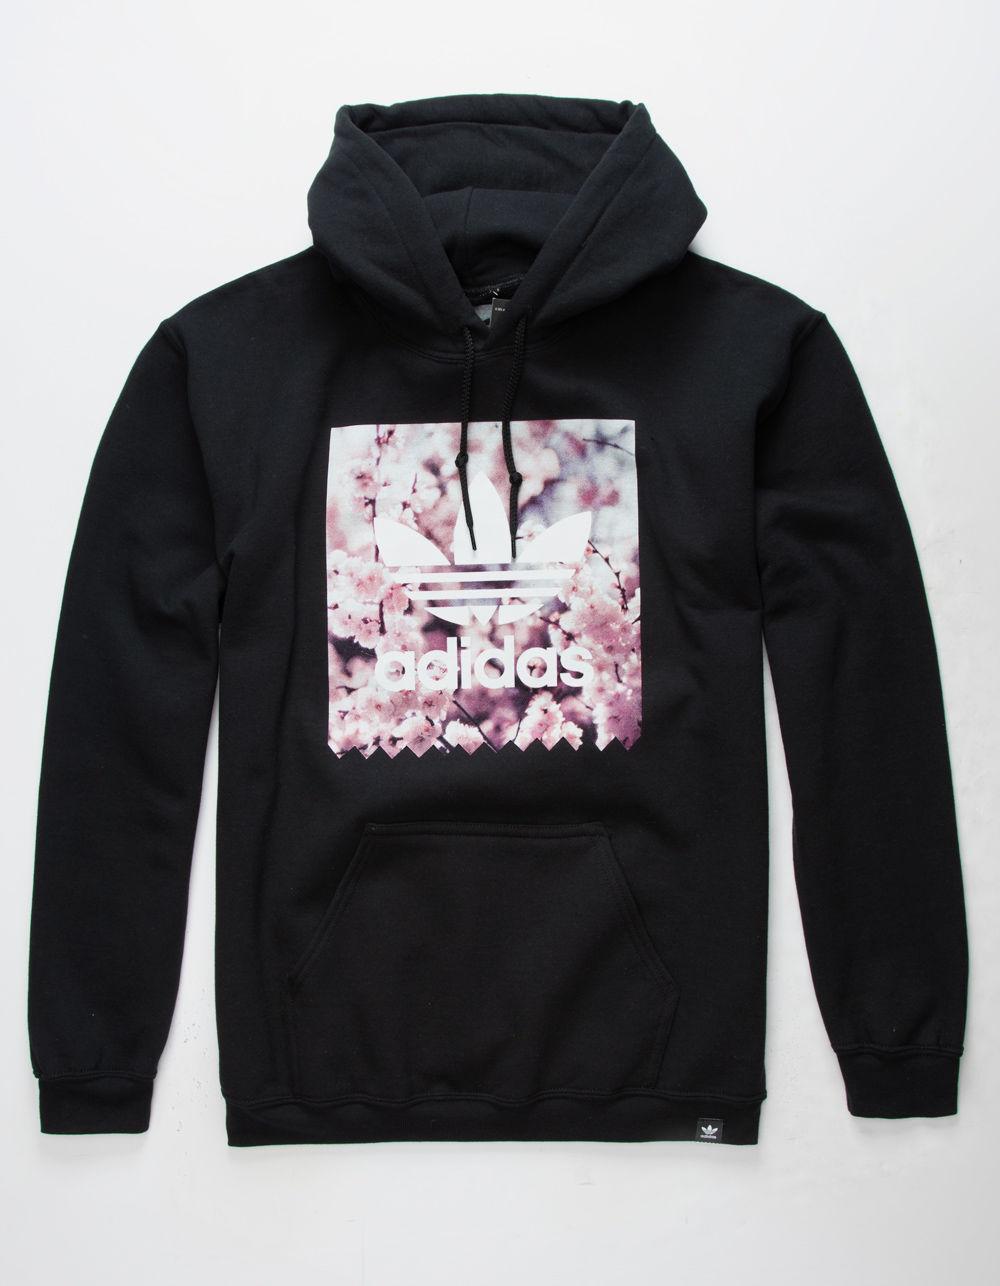 Predownload: Adidas Cherry Blossom Blackbird Mens Hoodie Black 341689100 Hoodies Men Hoodies White Sweatshirt Men [ 1286 x 1000 Pixel ]